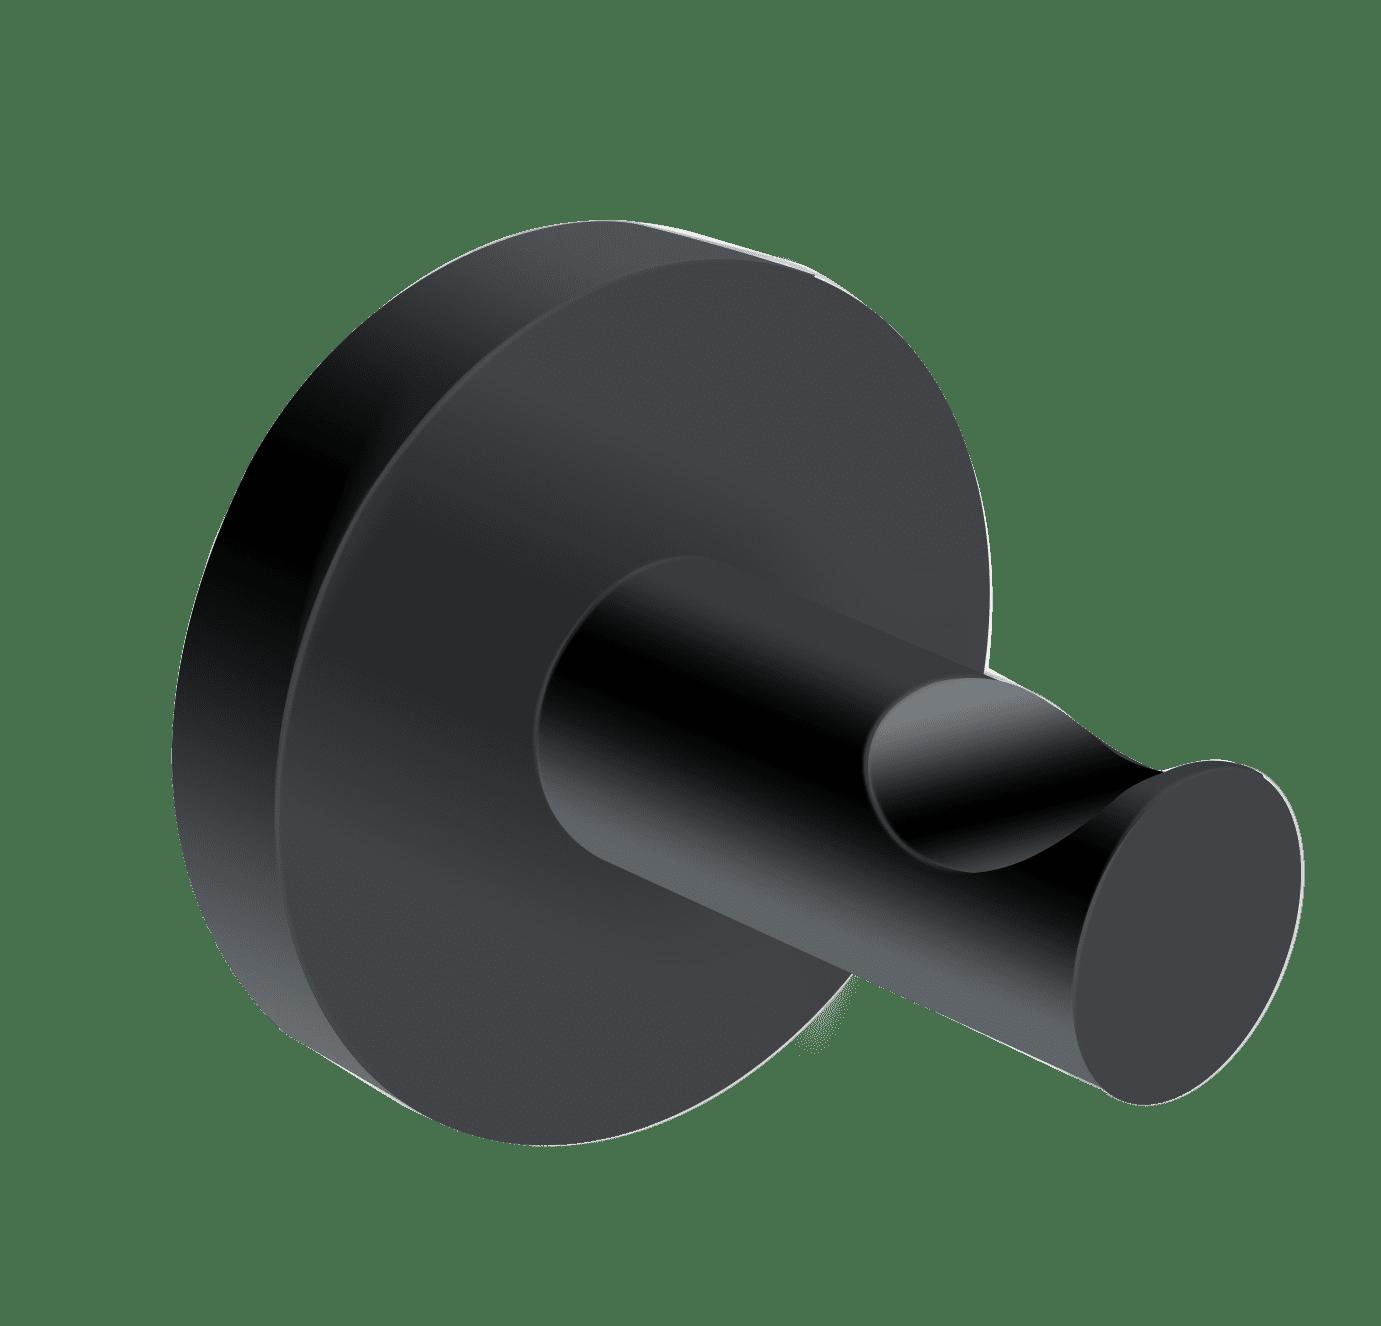 4bathroomz® Oslo set van 2 handoekhaakjes - Zwart